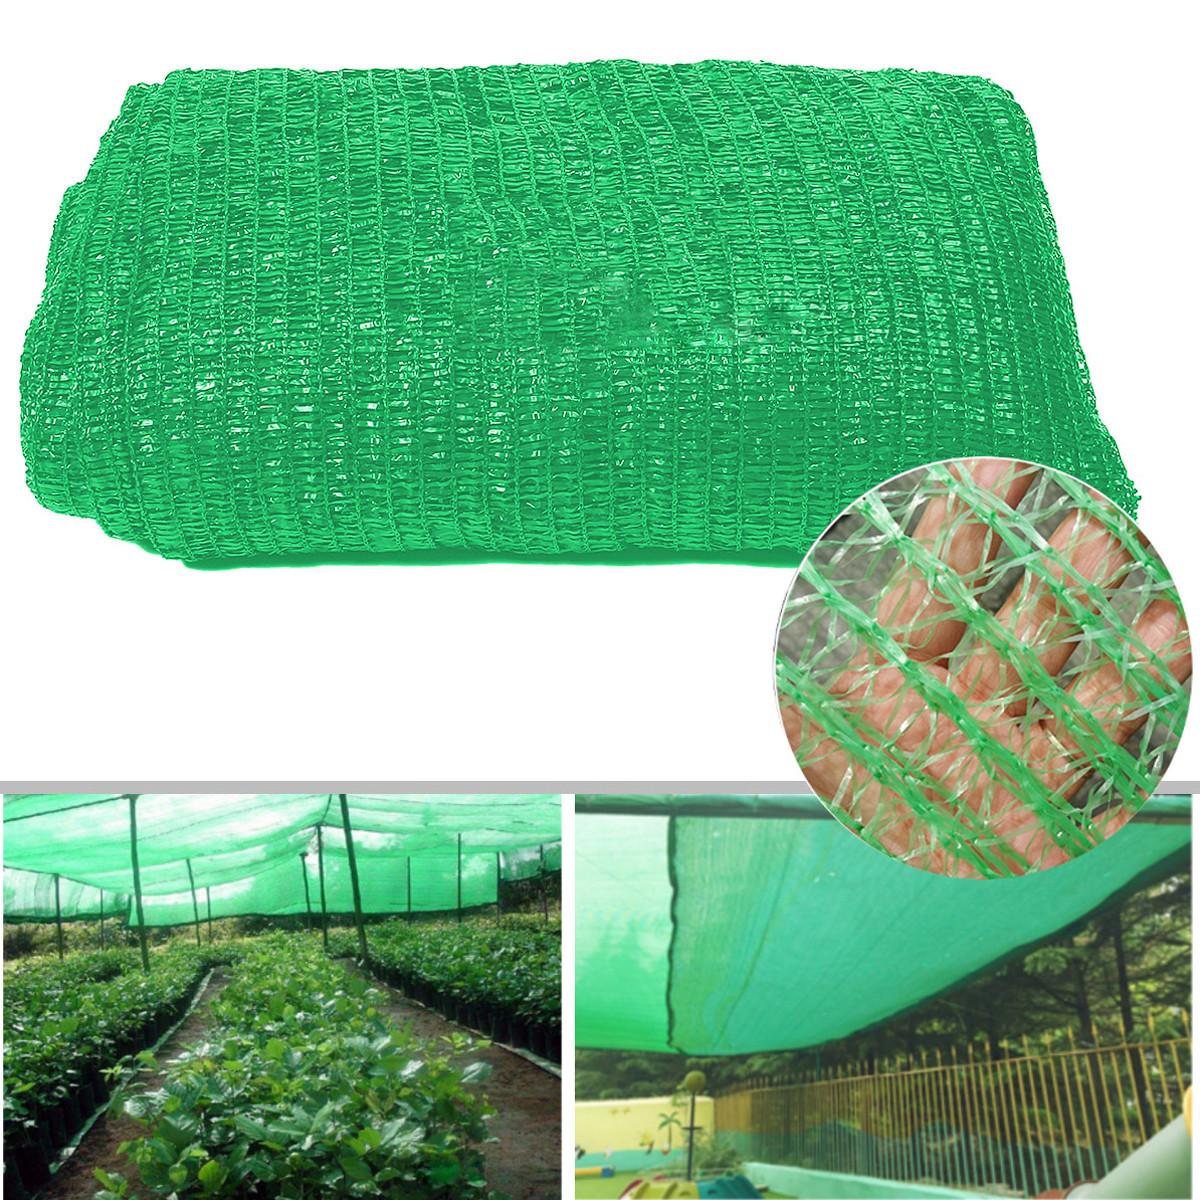 5x4m40%SunblockShadeClothзеленый Sunshade Net для Растение Обложка зеленыйhouse Barn 2 Pin Knit - 1TopShop